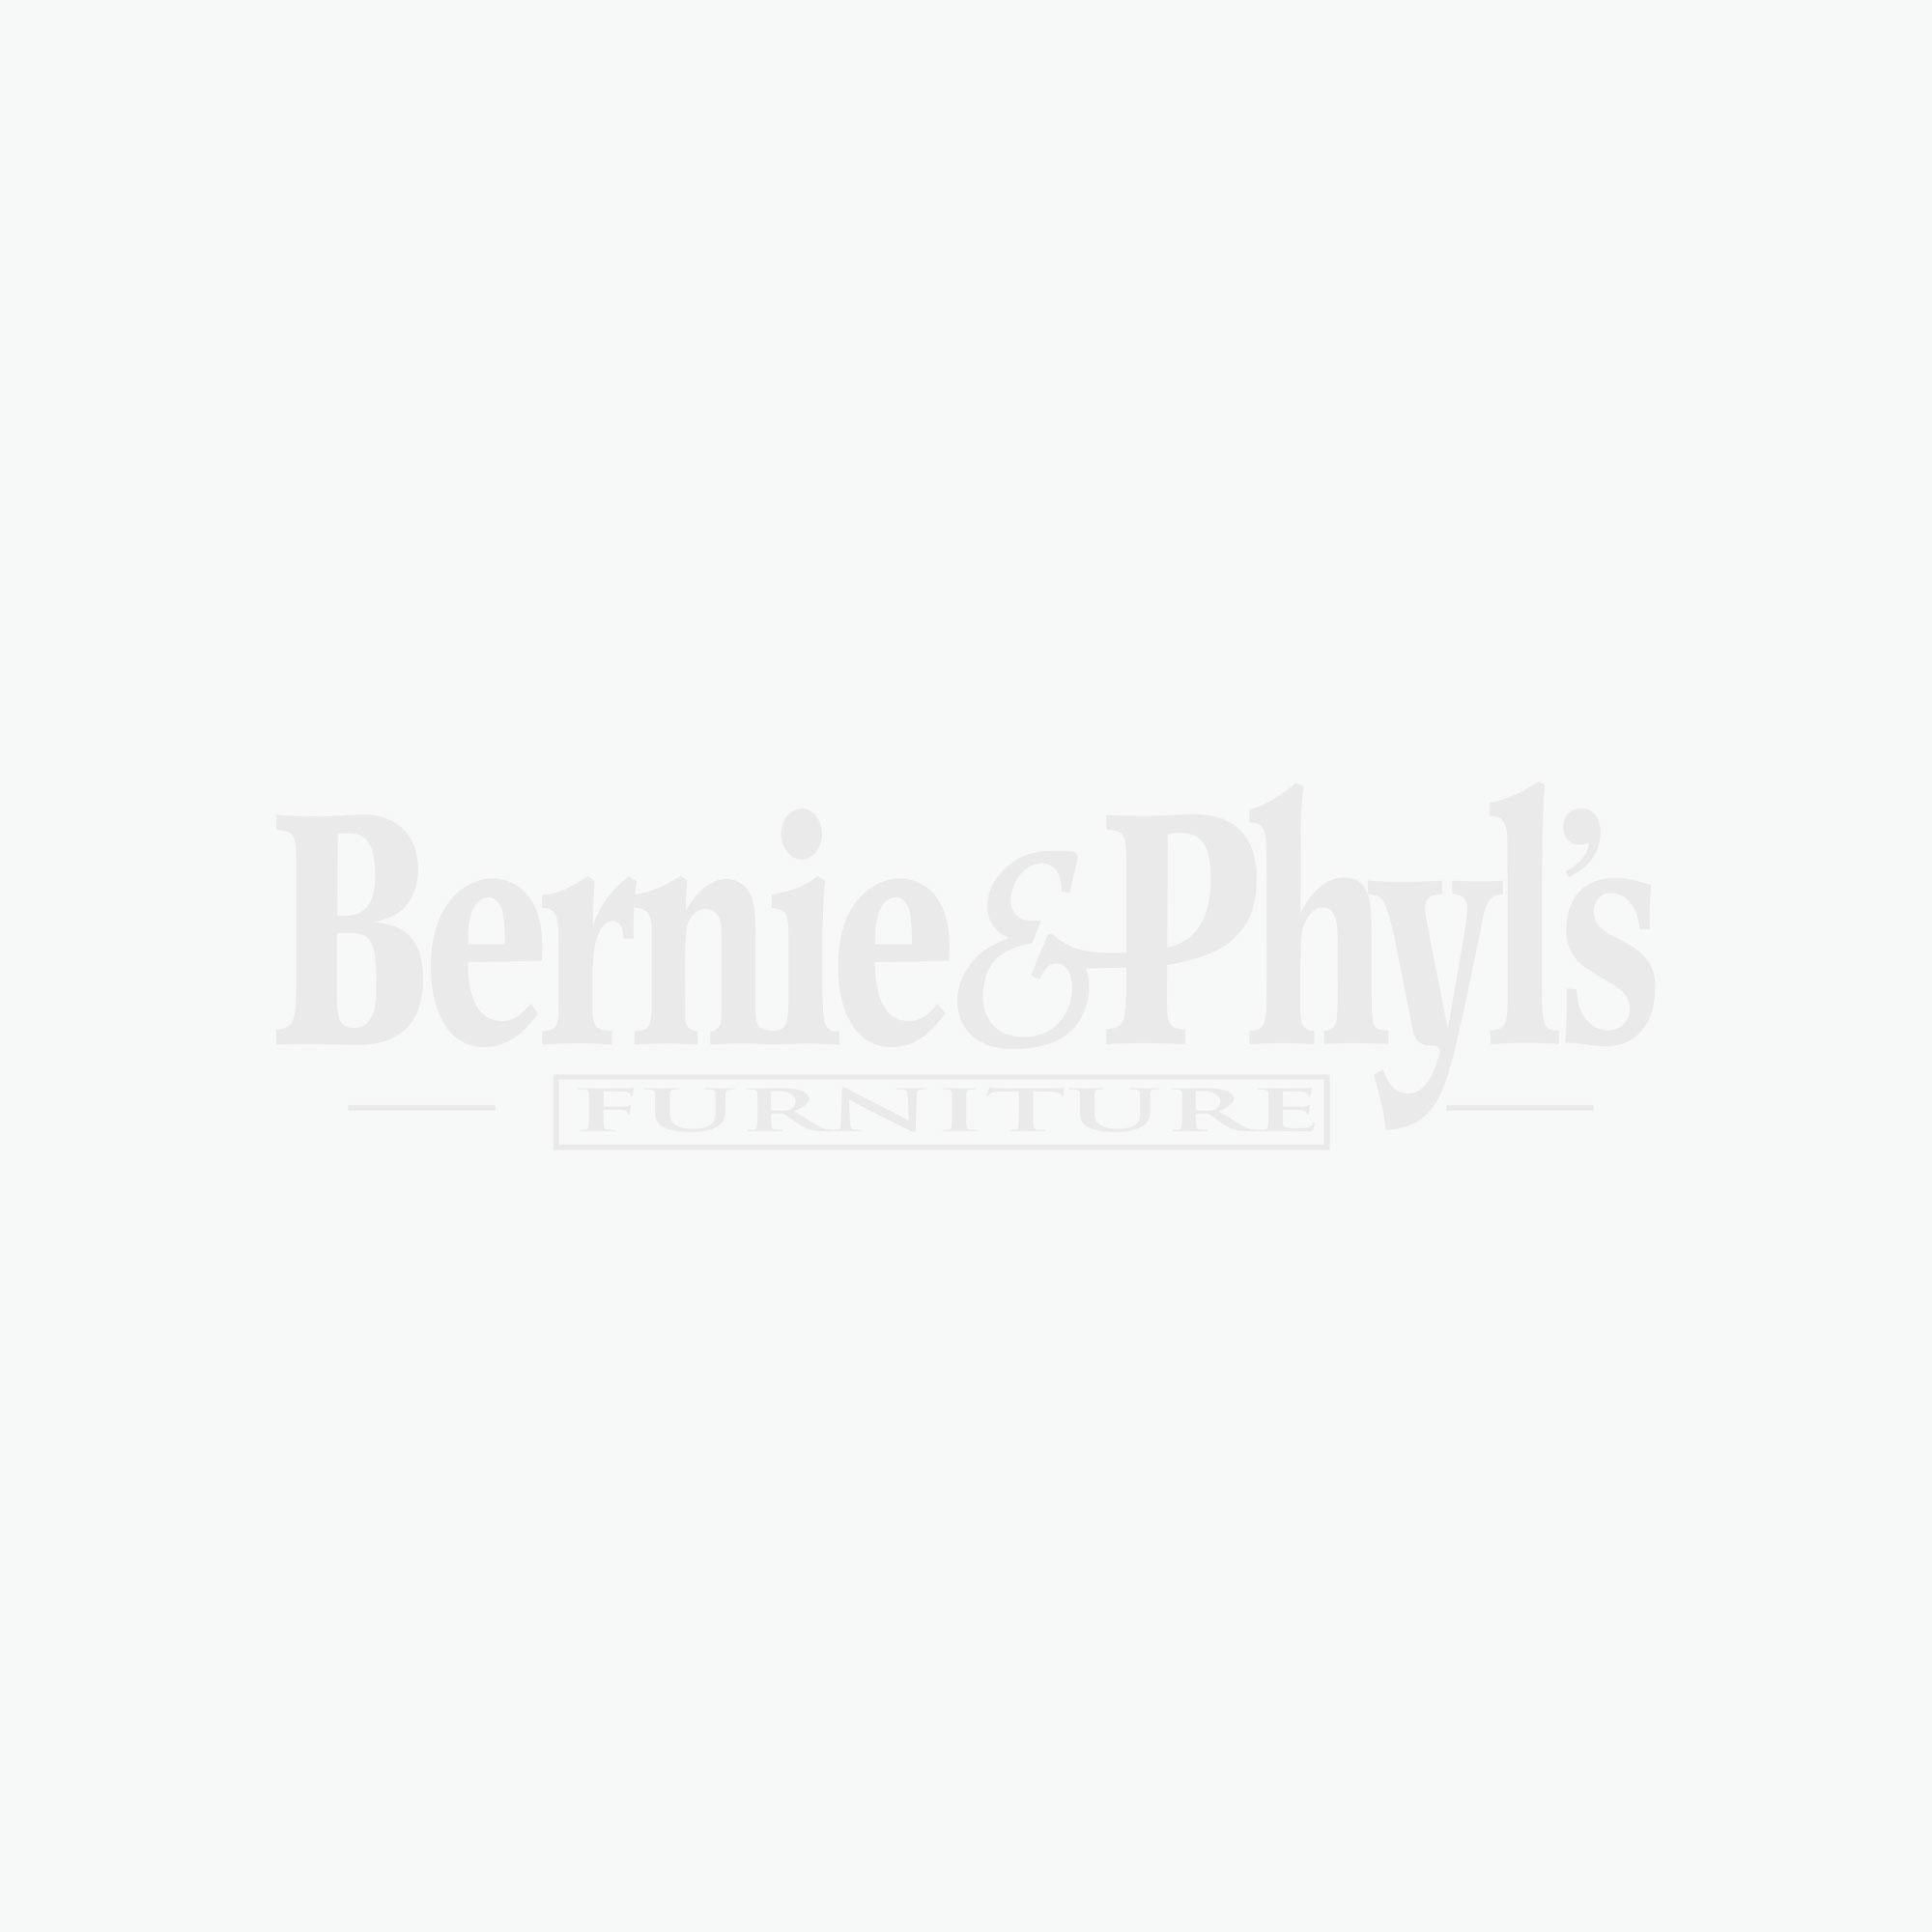 Sunbrella Sofas Sunbrella Fabrics Furniture Brands Bernie